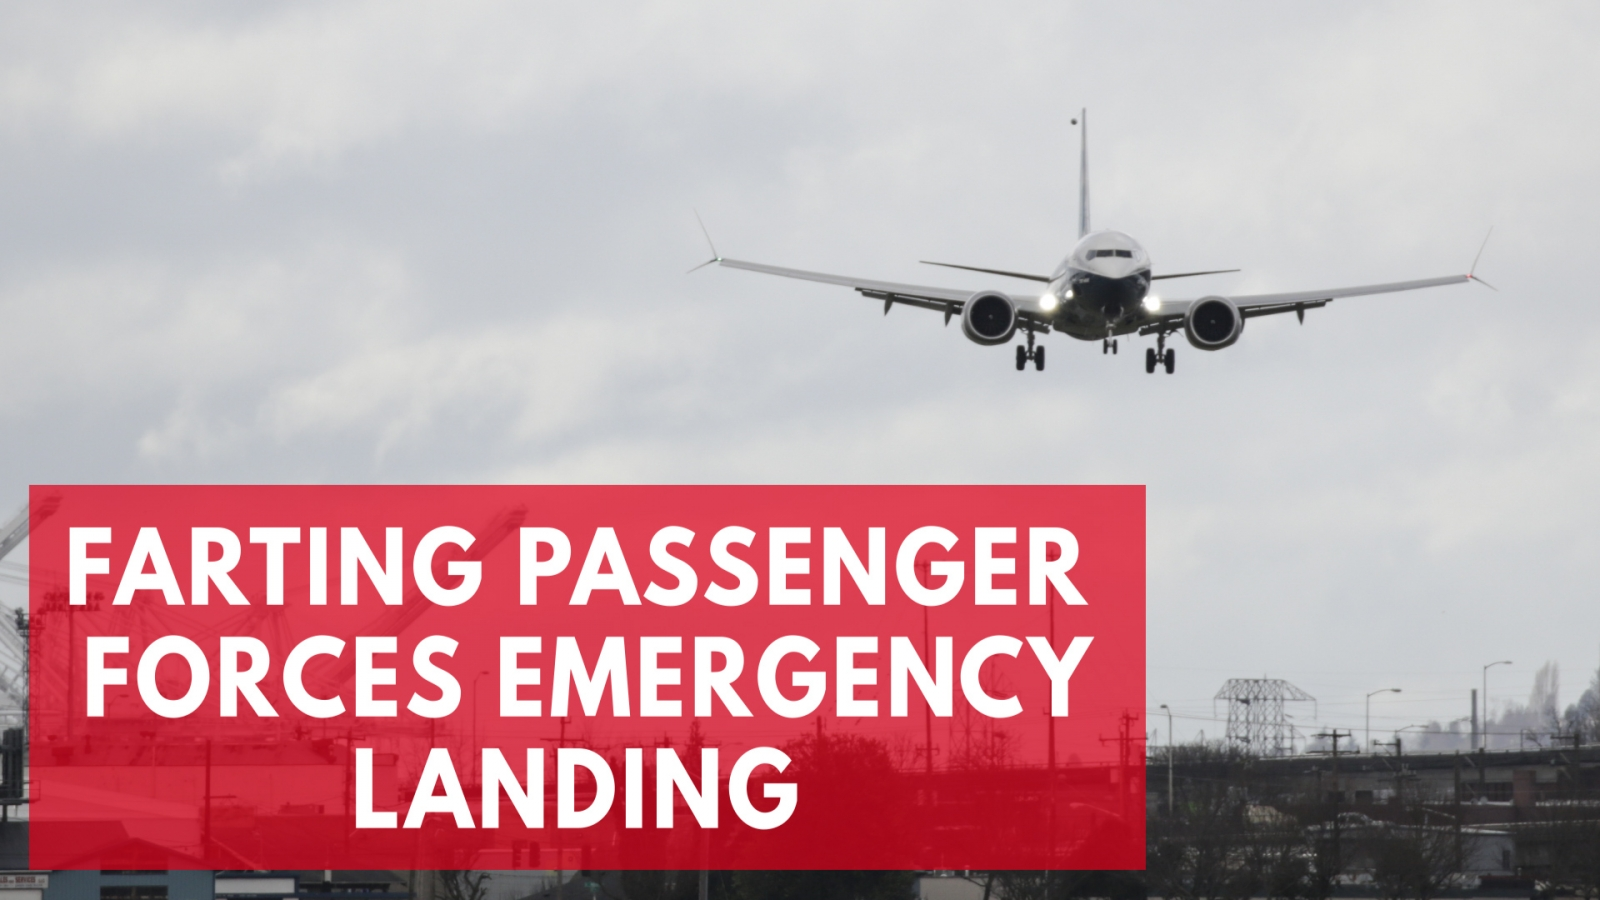 plane-makes-emergency-landing-in-vienna-after-passenger-brawl